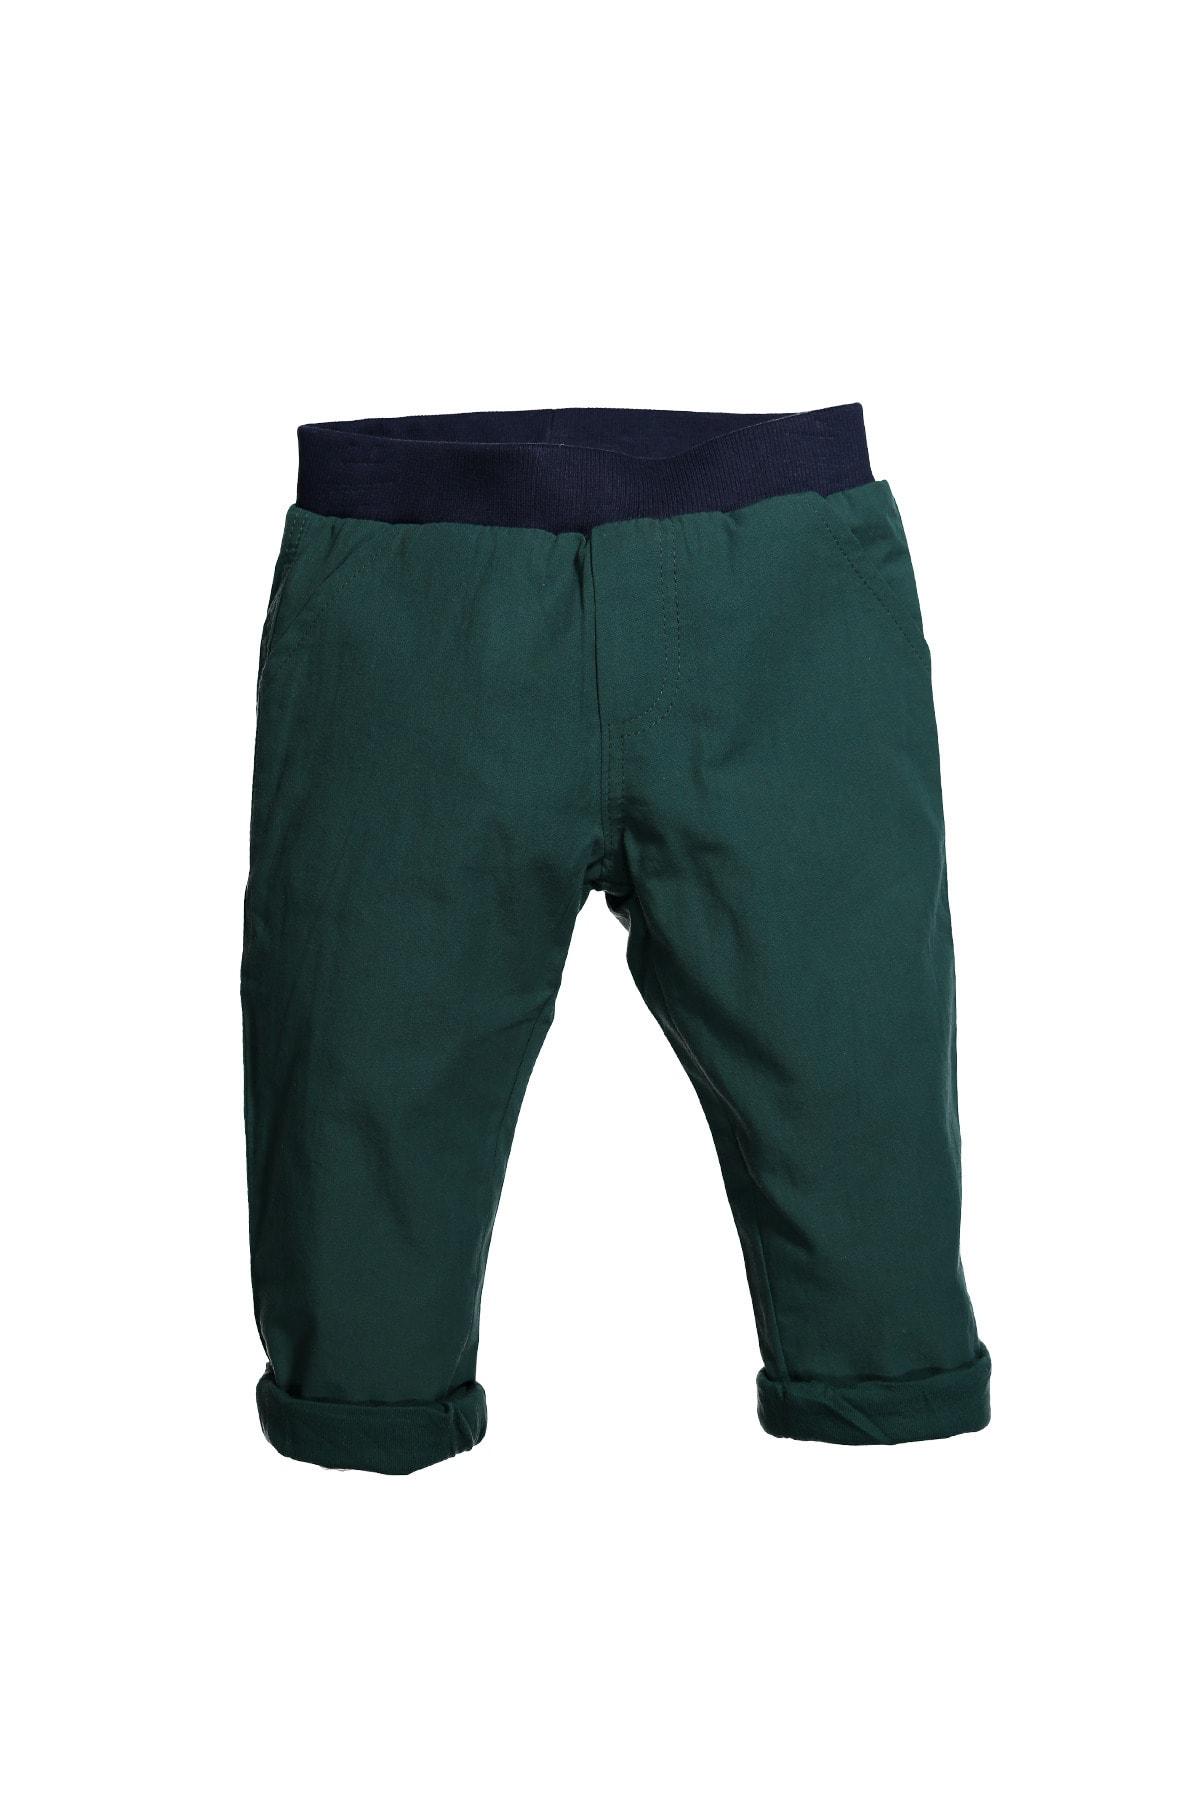 Erkek Bebek Haki Bel Lastikli Koton Pantolon